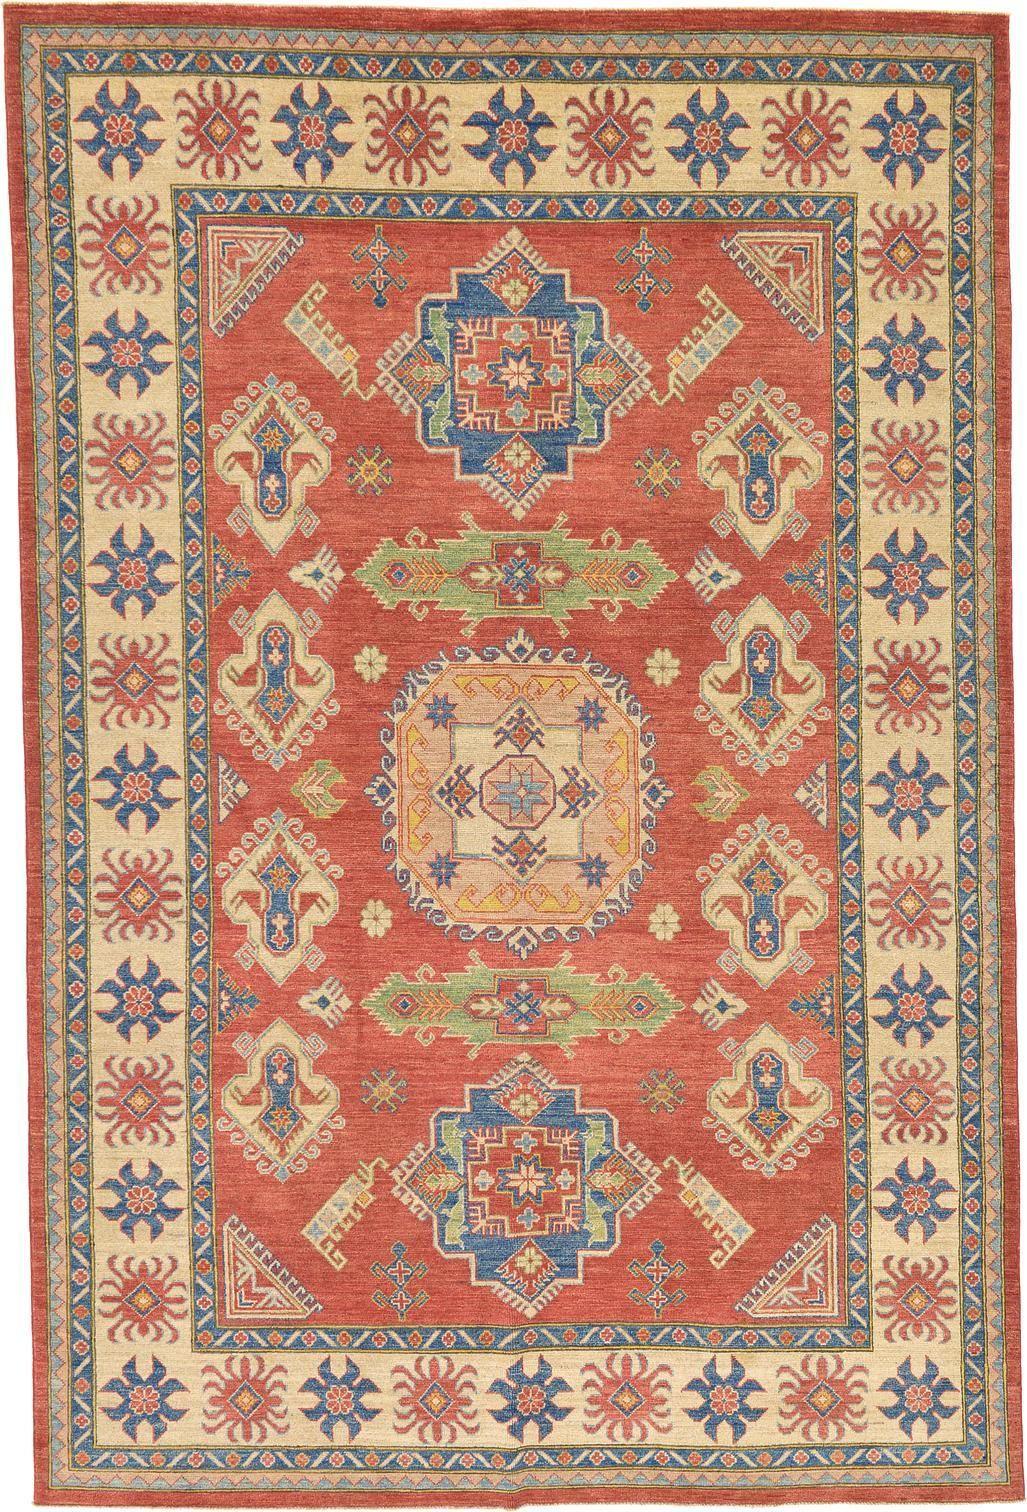 Rust Red 7 11 X 12 0 Geometric Kazak Rug Oriental Rugs Rugs Oriental Rug Oriental